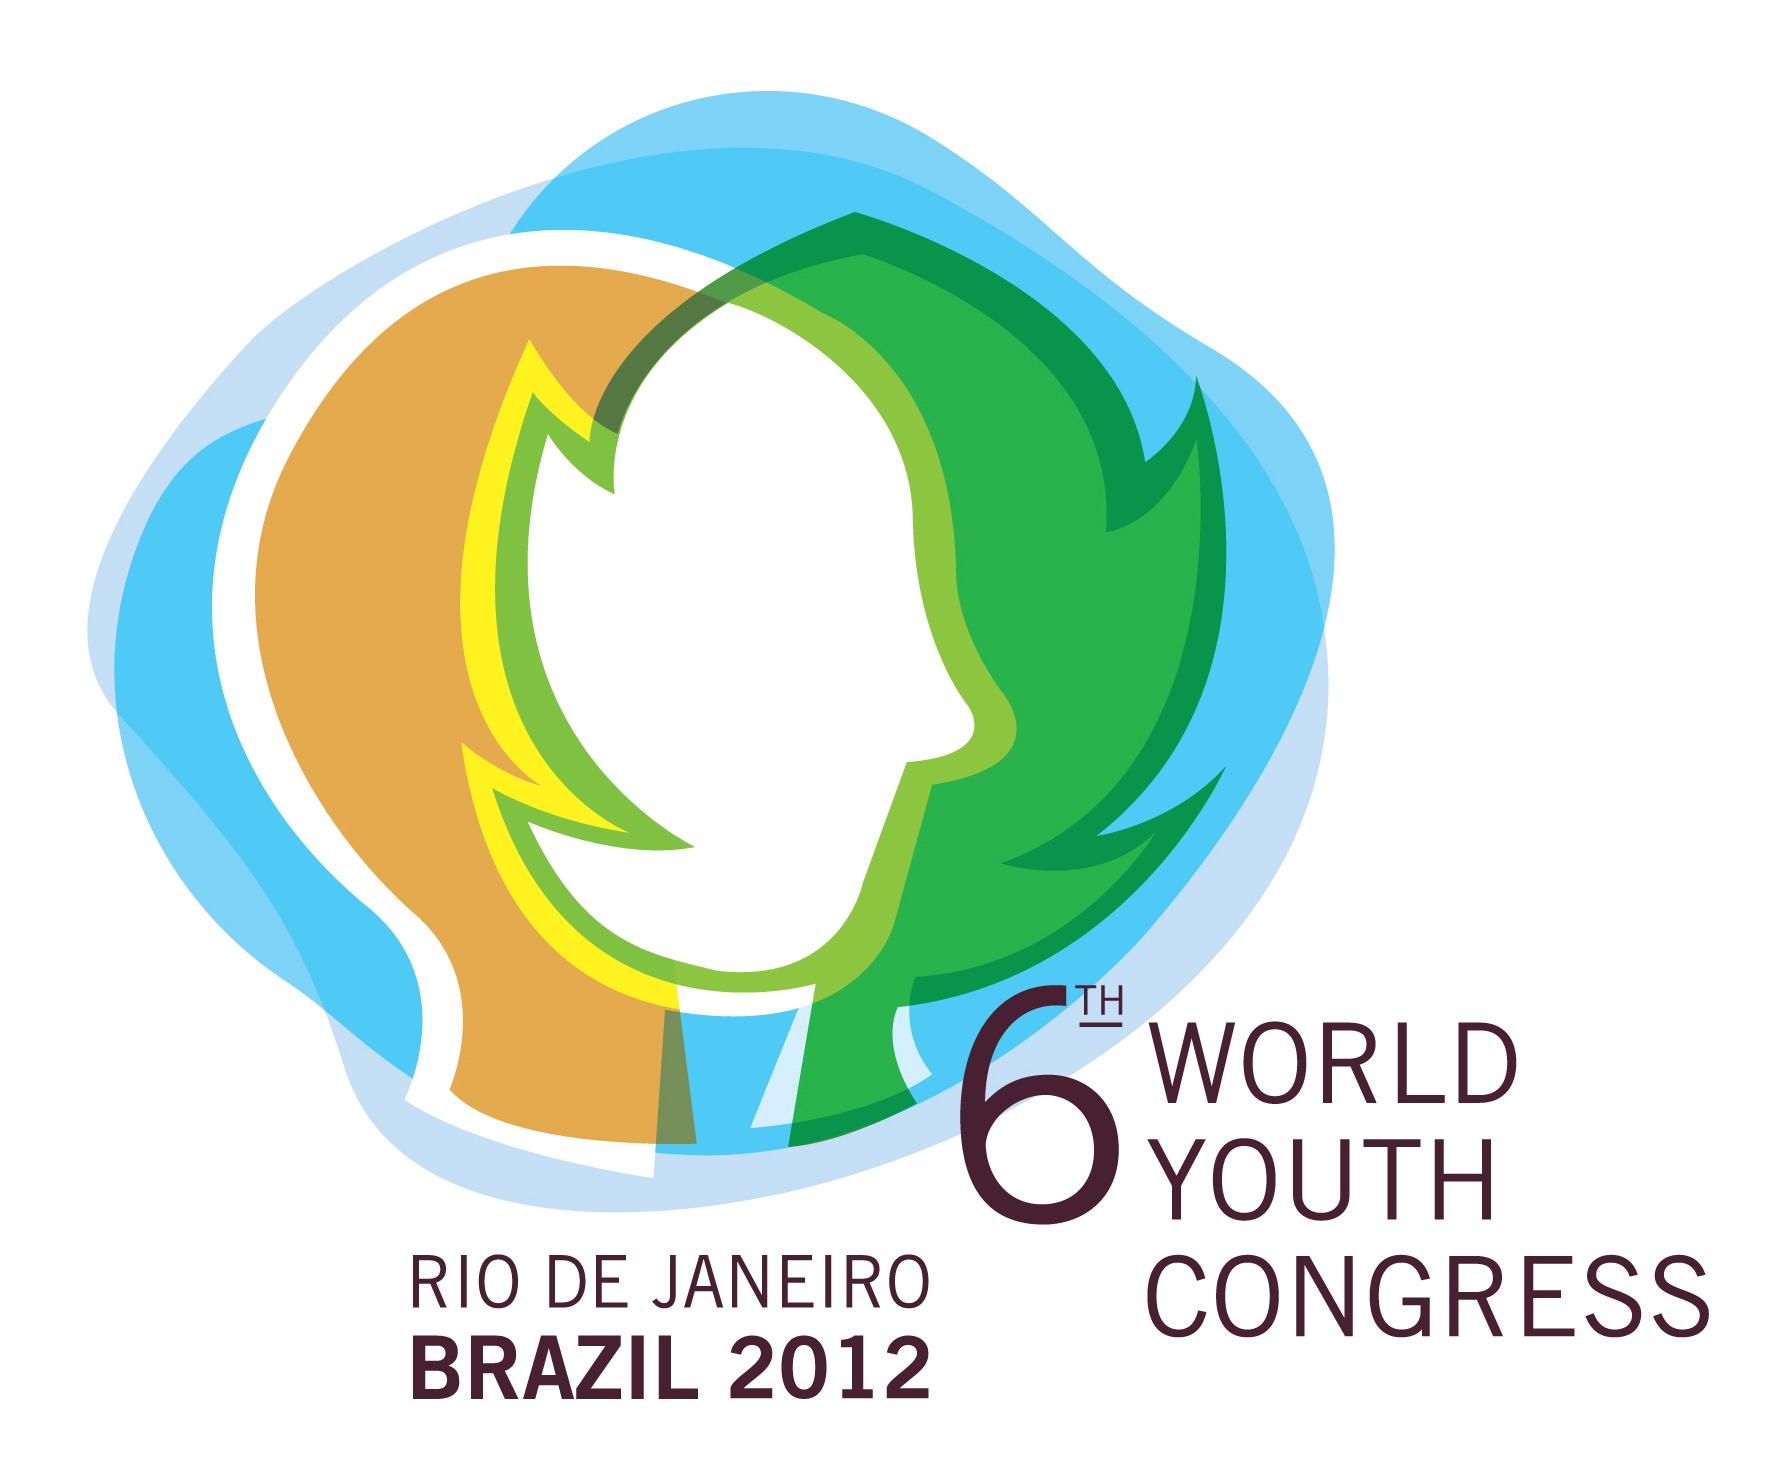 Congresso Mundial de Juventude busca voluntários